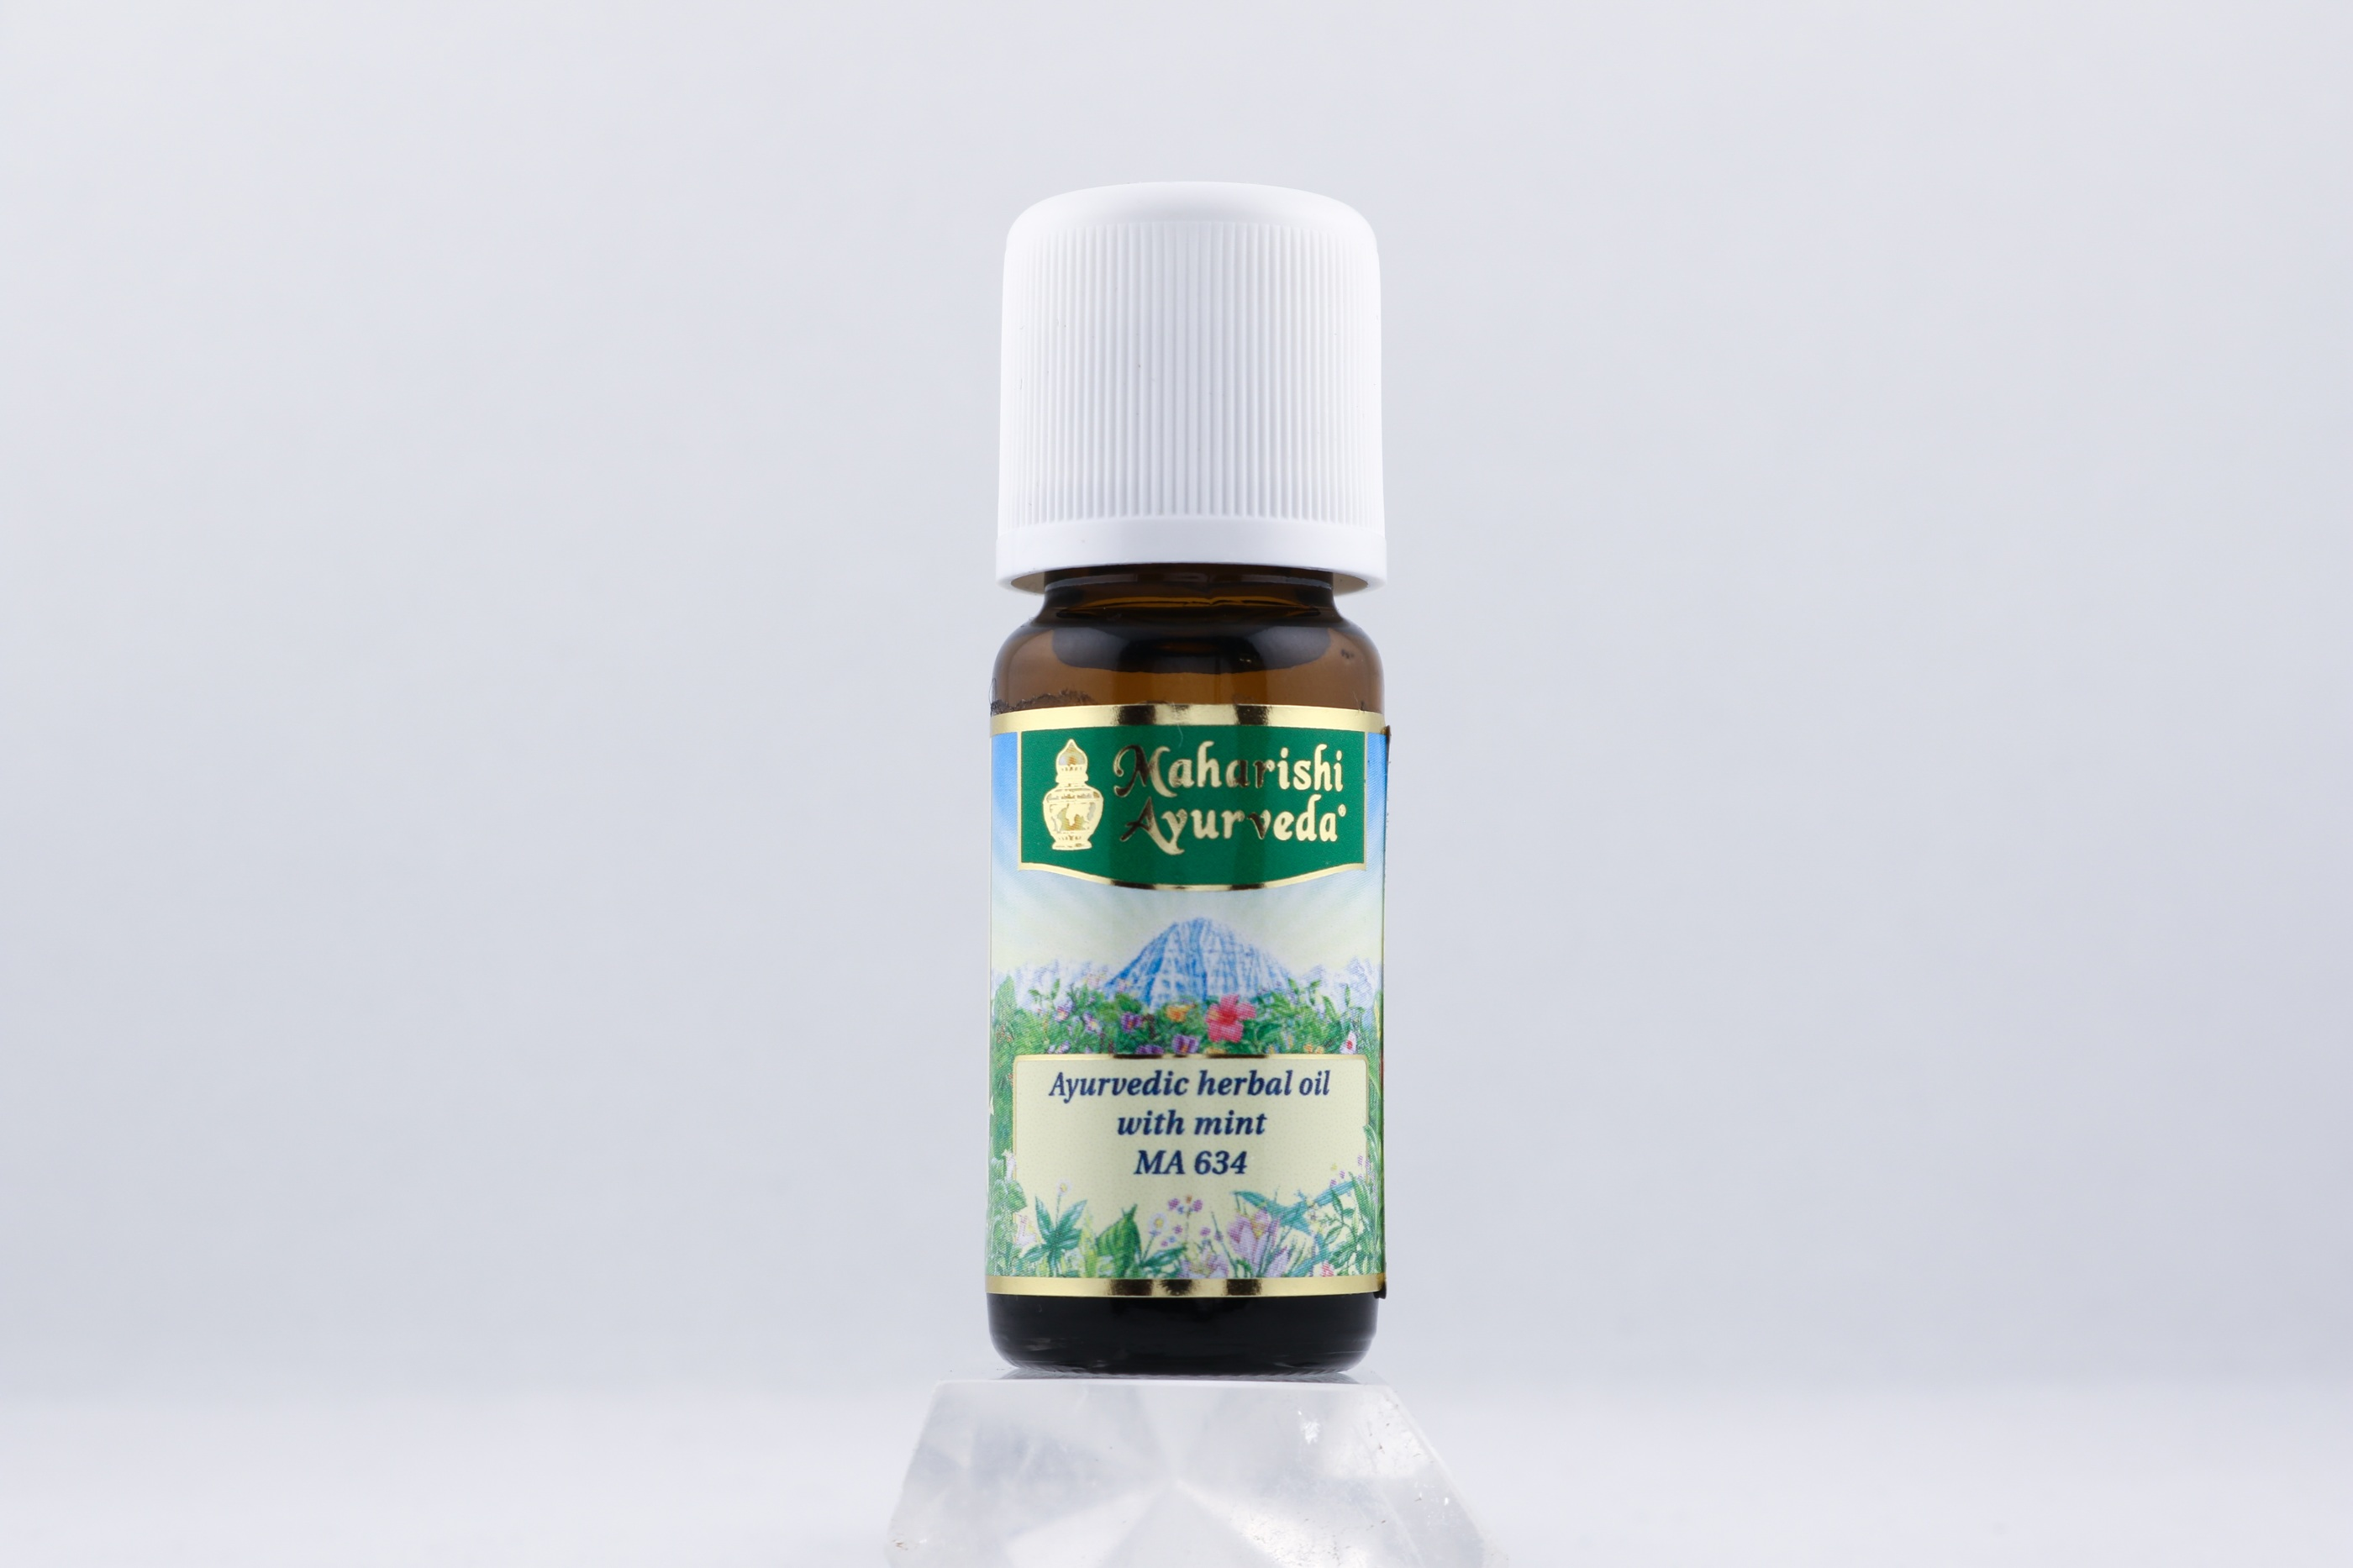 Ayurvedisk örtolja med mint wellness ayurveda halmstad sweden svensk eterisk aroma olja